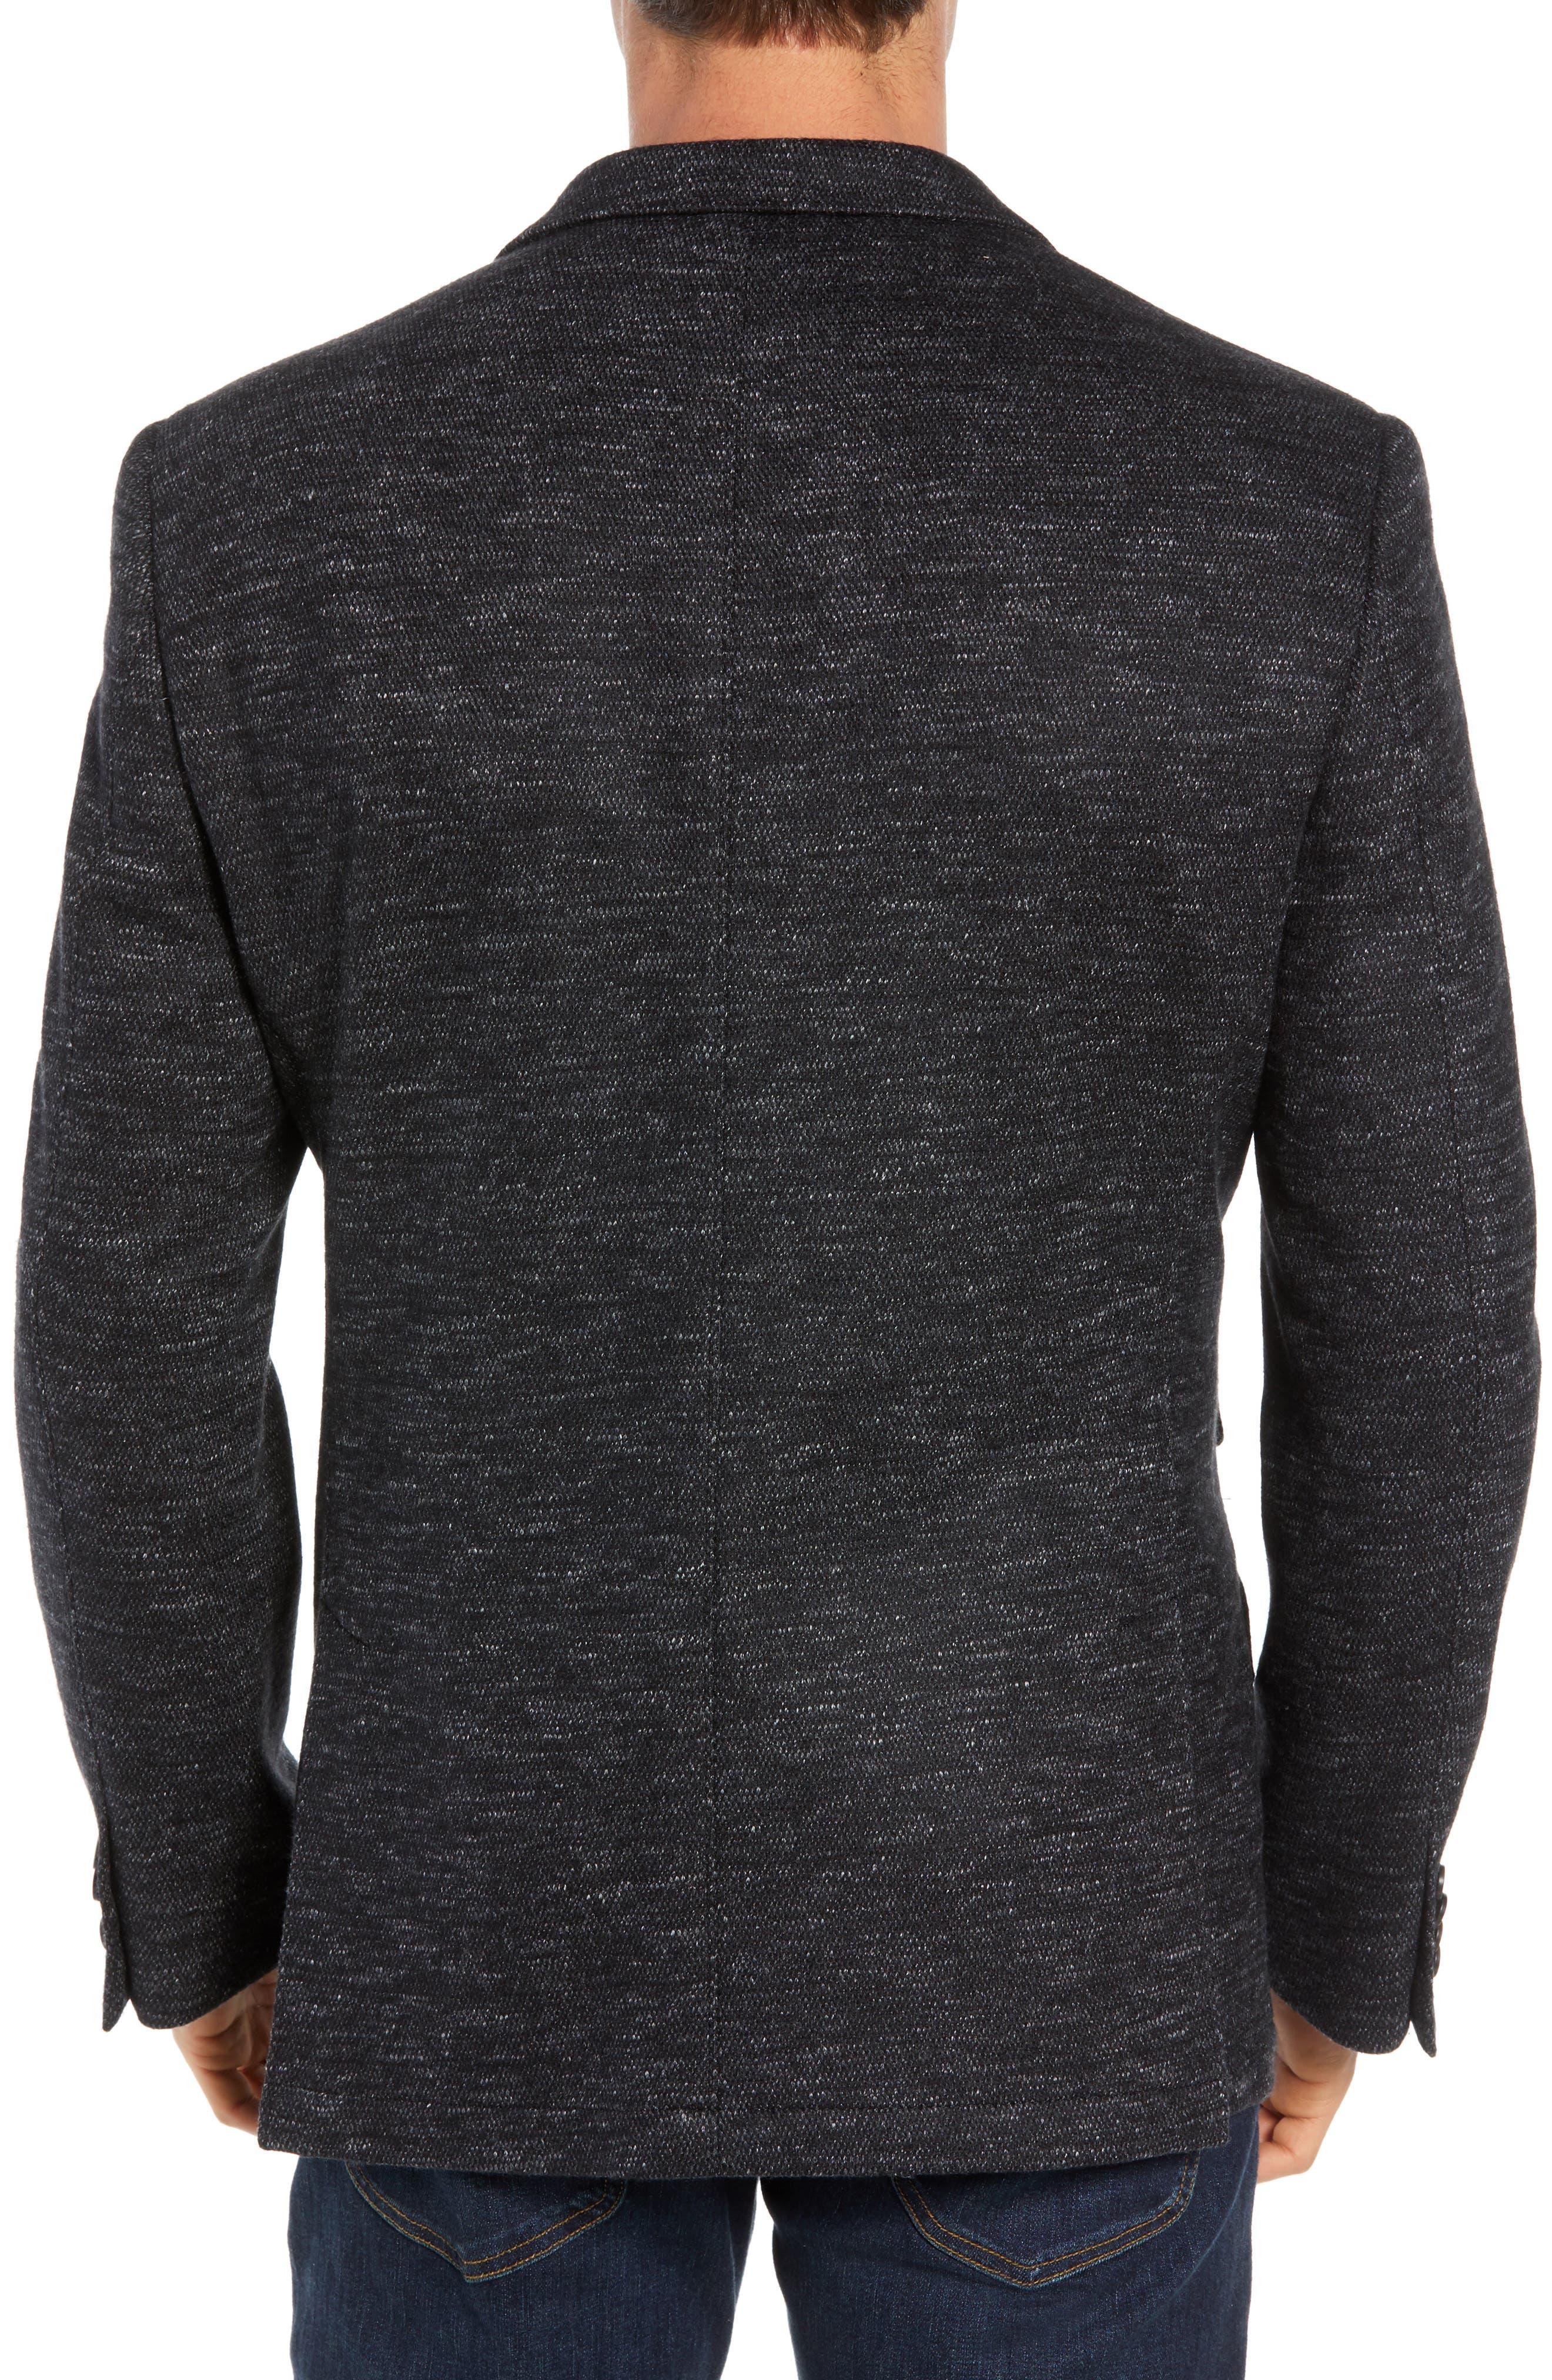 Regular Fit Knit Wool Blend Sport Coat,                             Alternate thumbnail 2, color,                             CHARCOAL